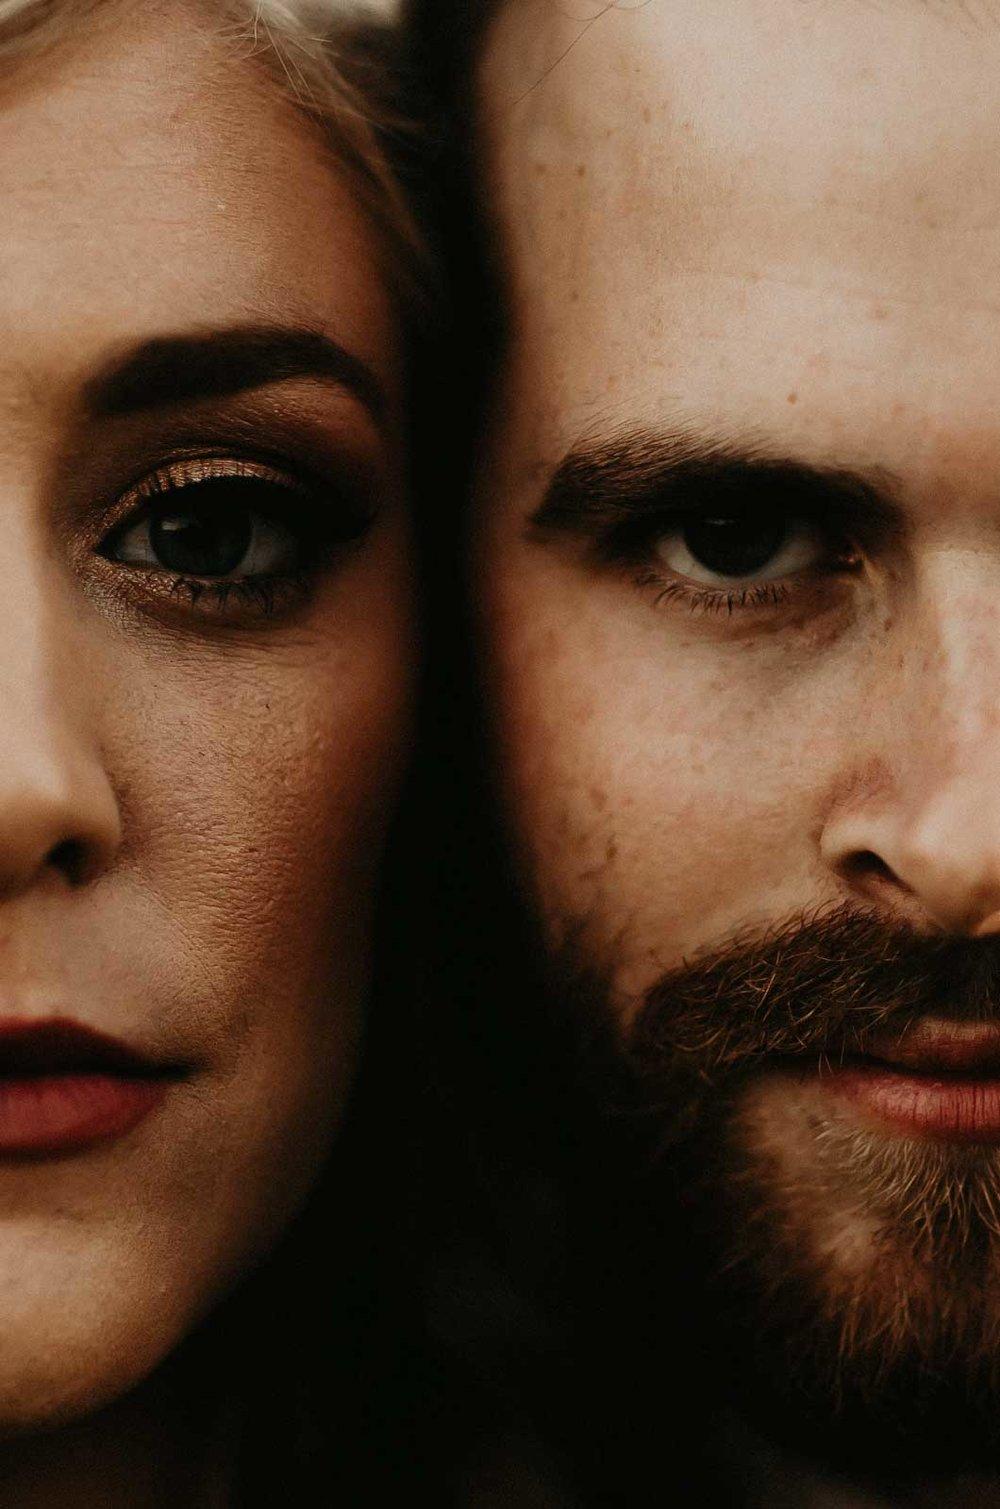 ivy-ink-photography-couple-portrait-faces.jpg